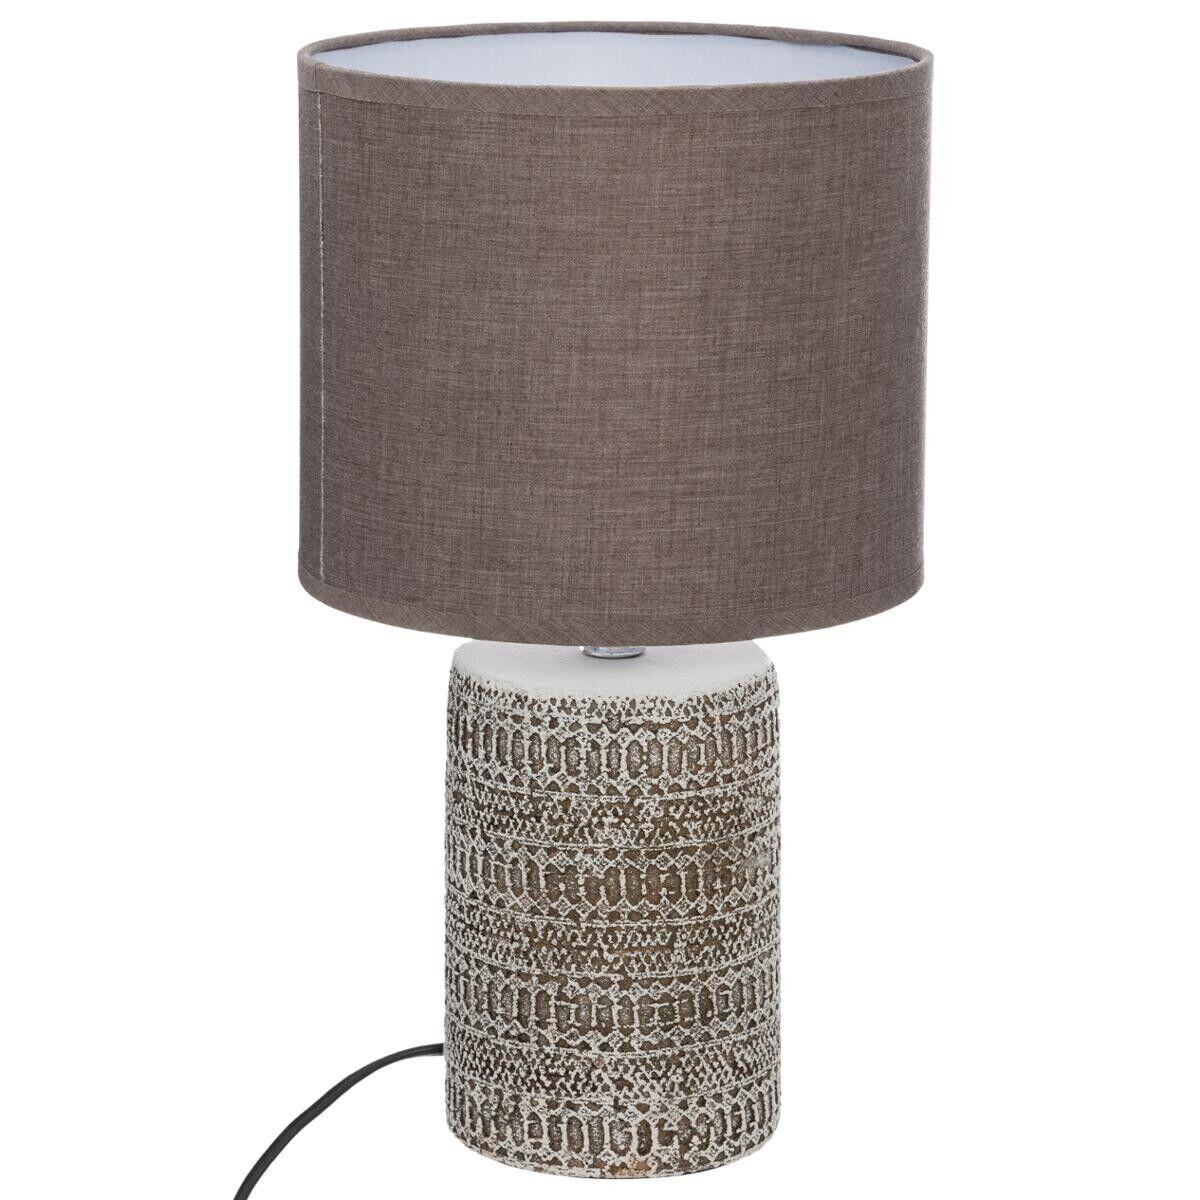 Atmosphera Lampe 'Melo' taupe, céramique H34 cm